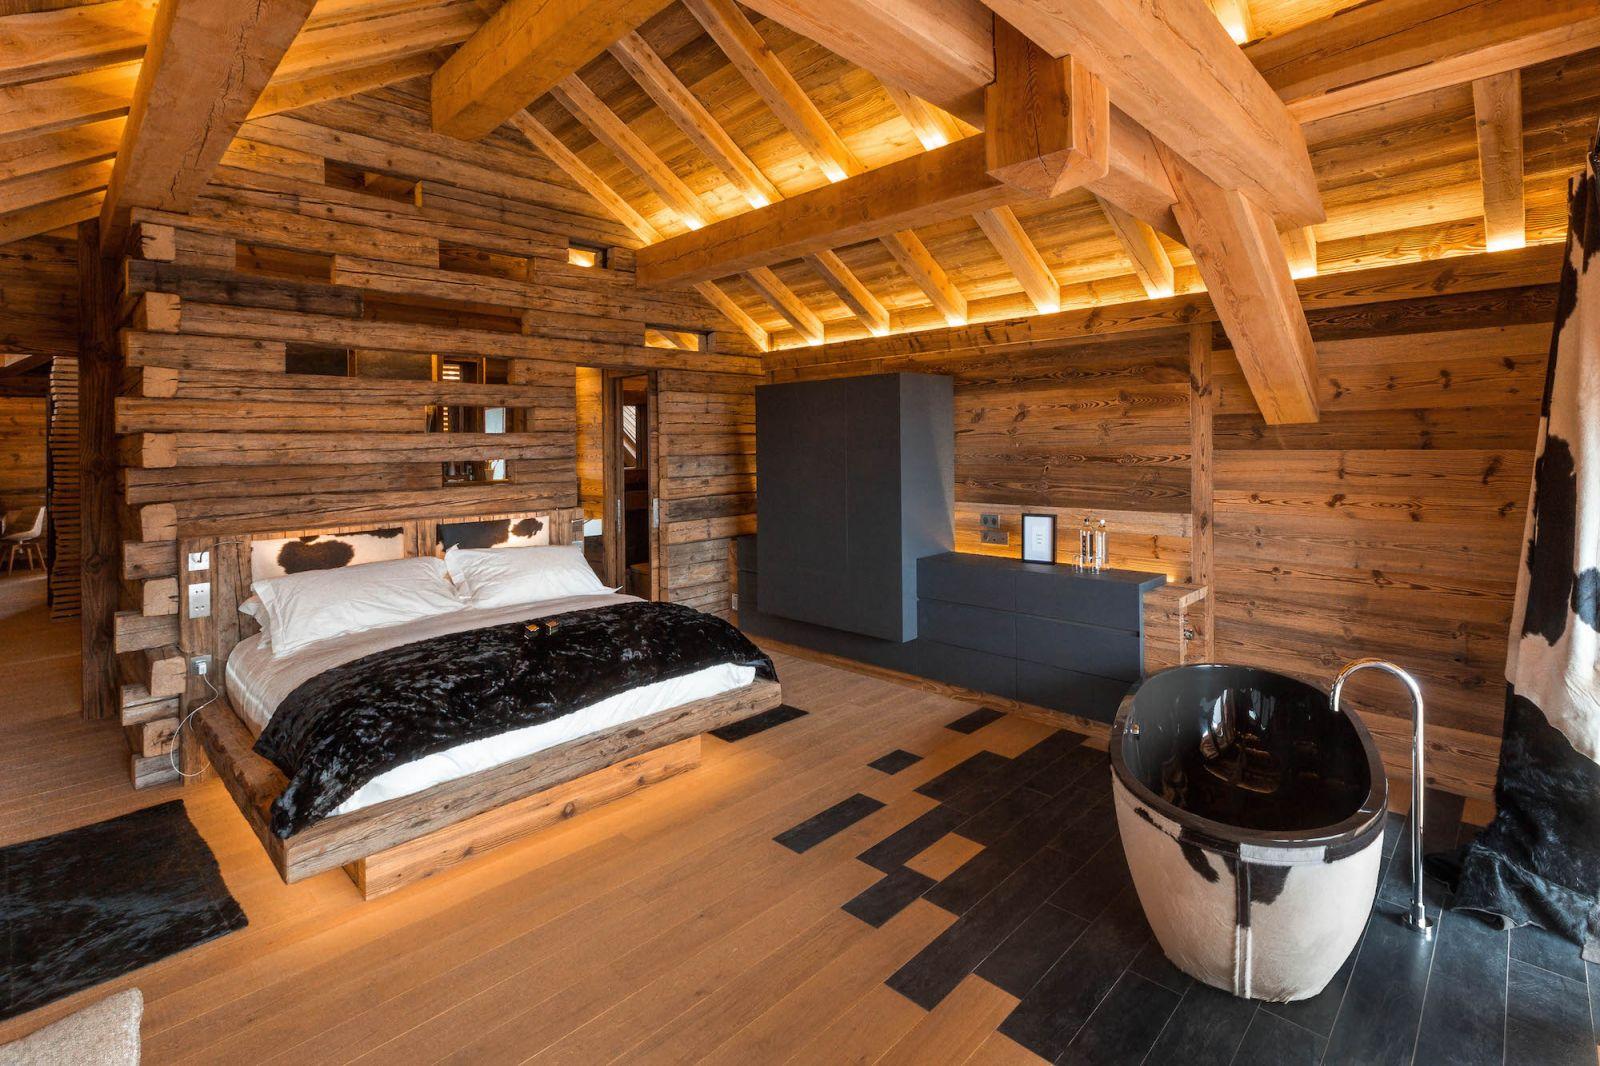 location chalet luxe serre chevalier pied des pistes piscine interieure. Black Bedroom Furniture Sets. Home Design Ideas